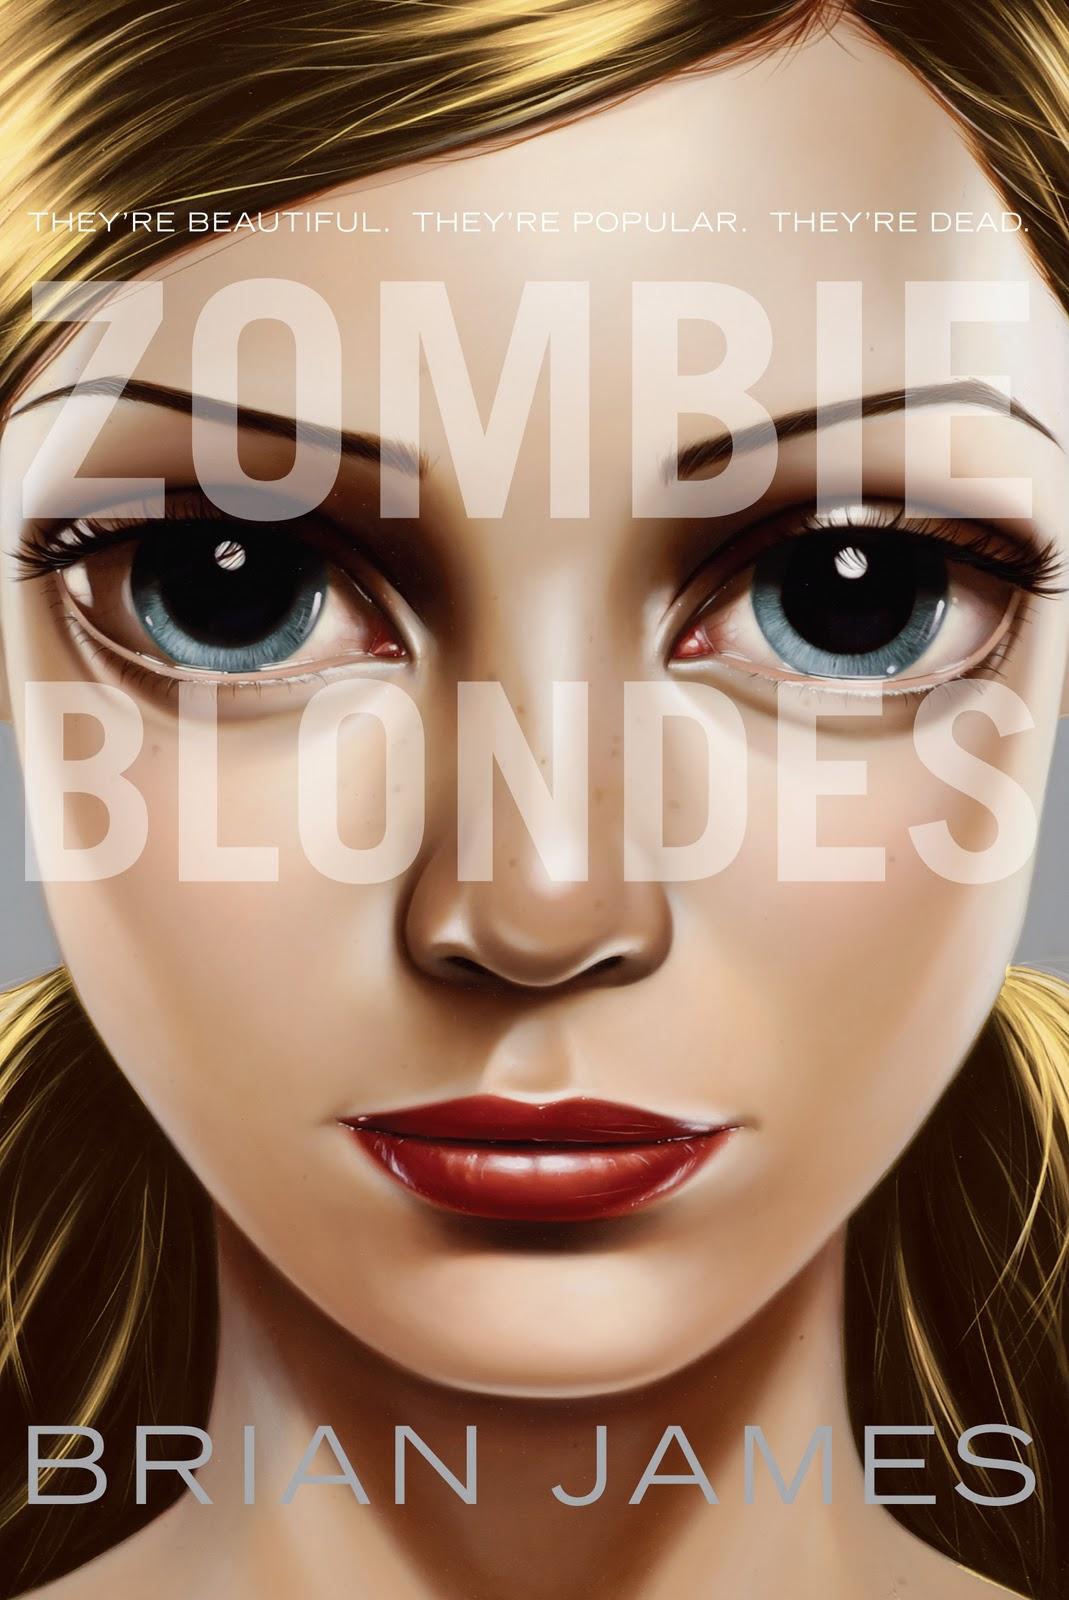 http://1.bp.blogspot.com/_Yx-7eVkZgYQ/TSIj1YLXgEI/AAAAAAAAAqI/goN4JB6EAaQ/s1600/zombie-blondes.jpg